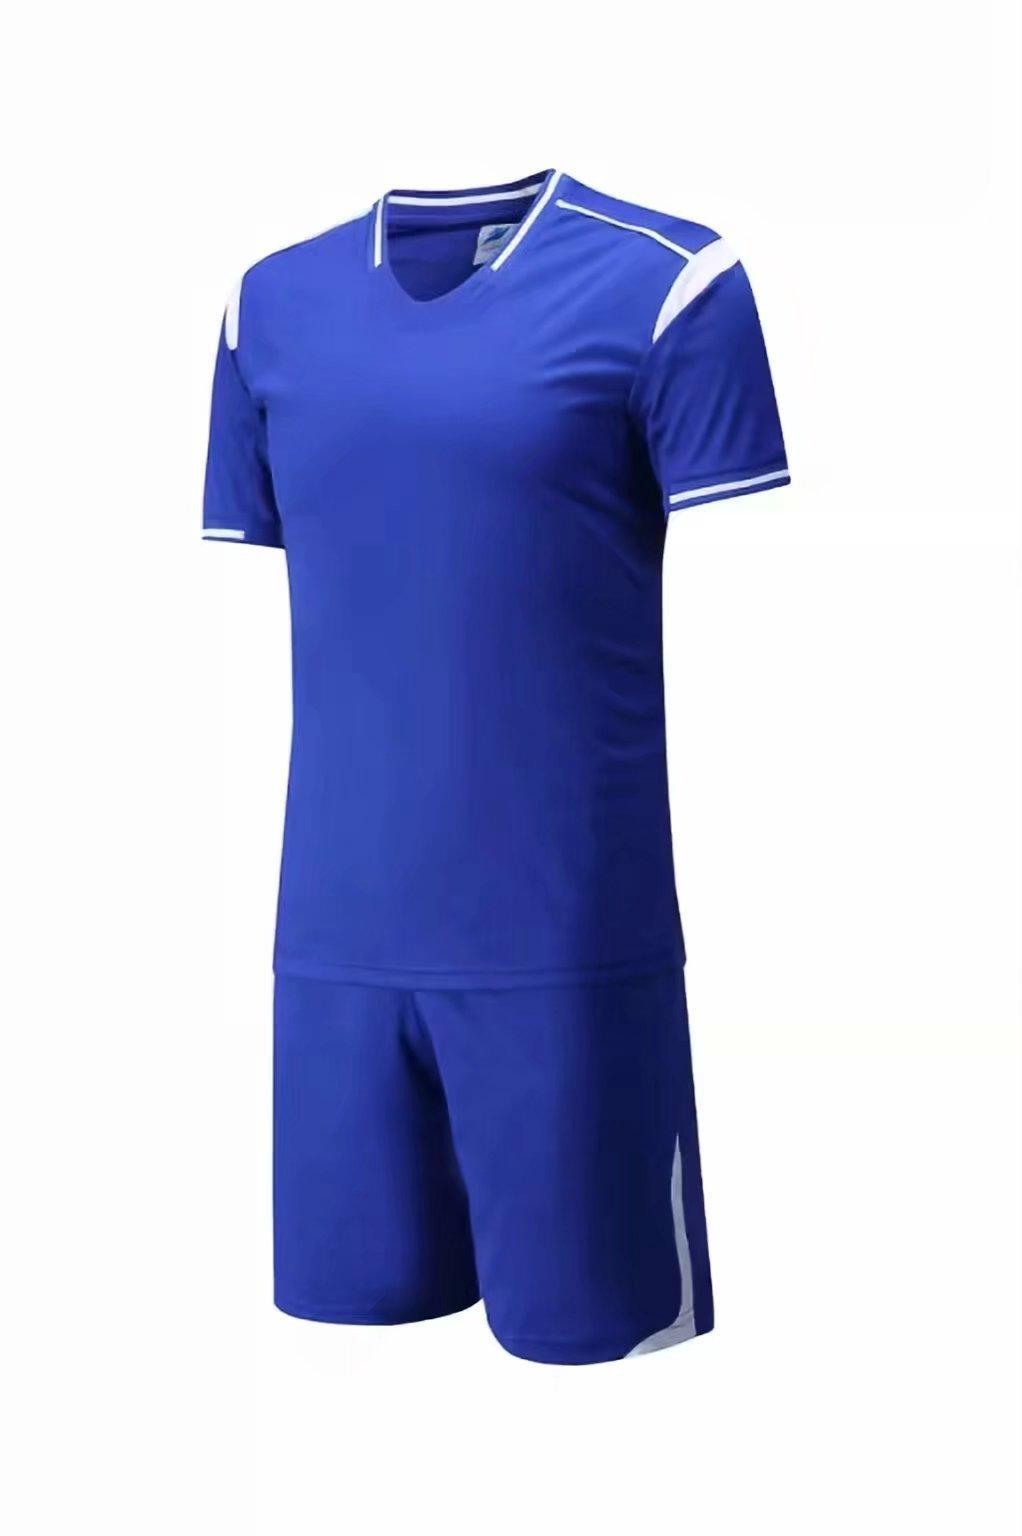 Tailândia 2020 Chelsea Soccer Jersey HAZARD PULISIC Kit Camisa De Futebol 2018 2019 Chelsea GIROUD HIGUAIN LOFTUS-CHEEK 18 19 camisa de futebol ODOI KANTE Willian DAVID LUIZ